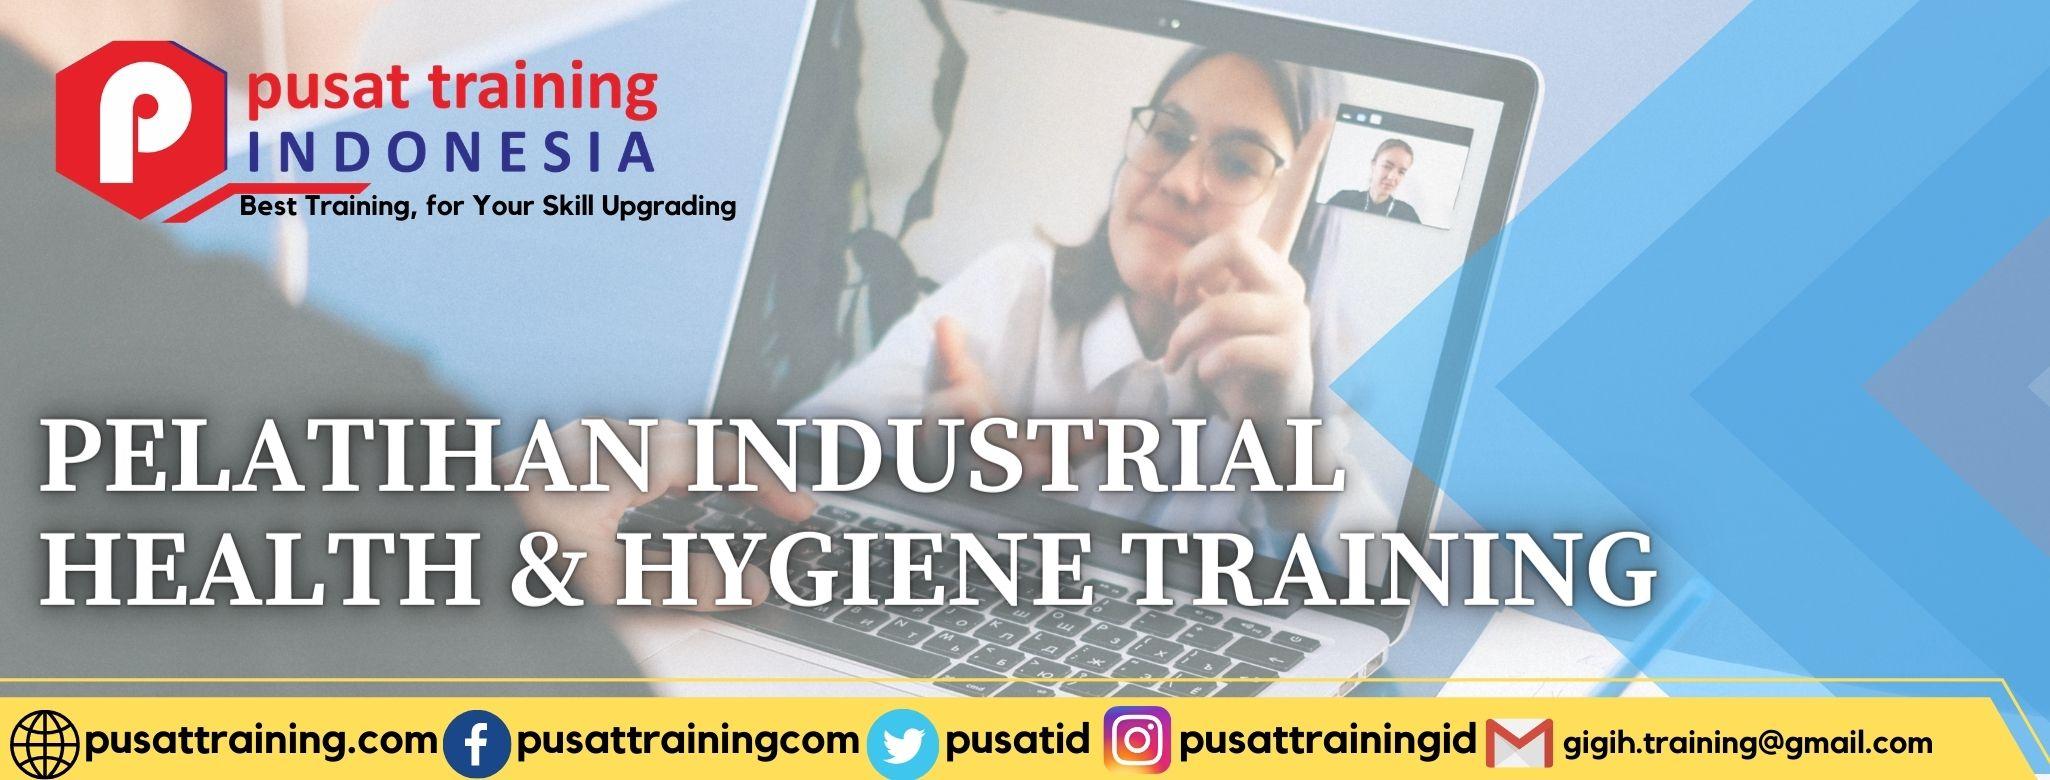 pelatihan-industrial-health-hygiene-training